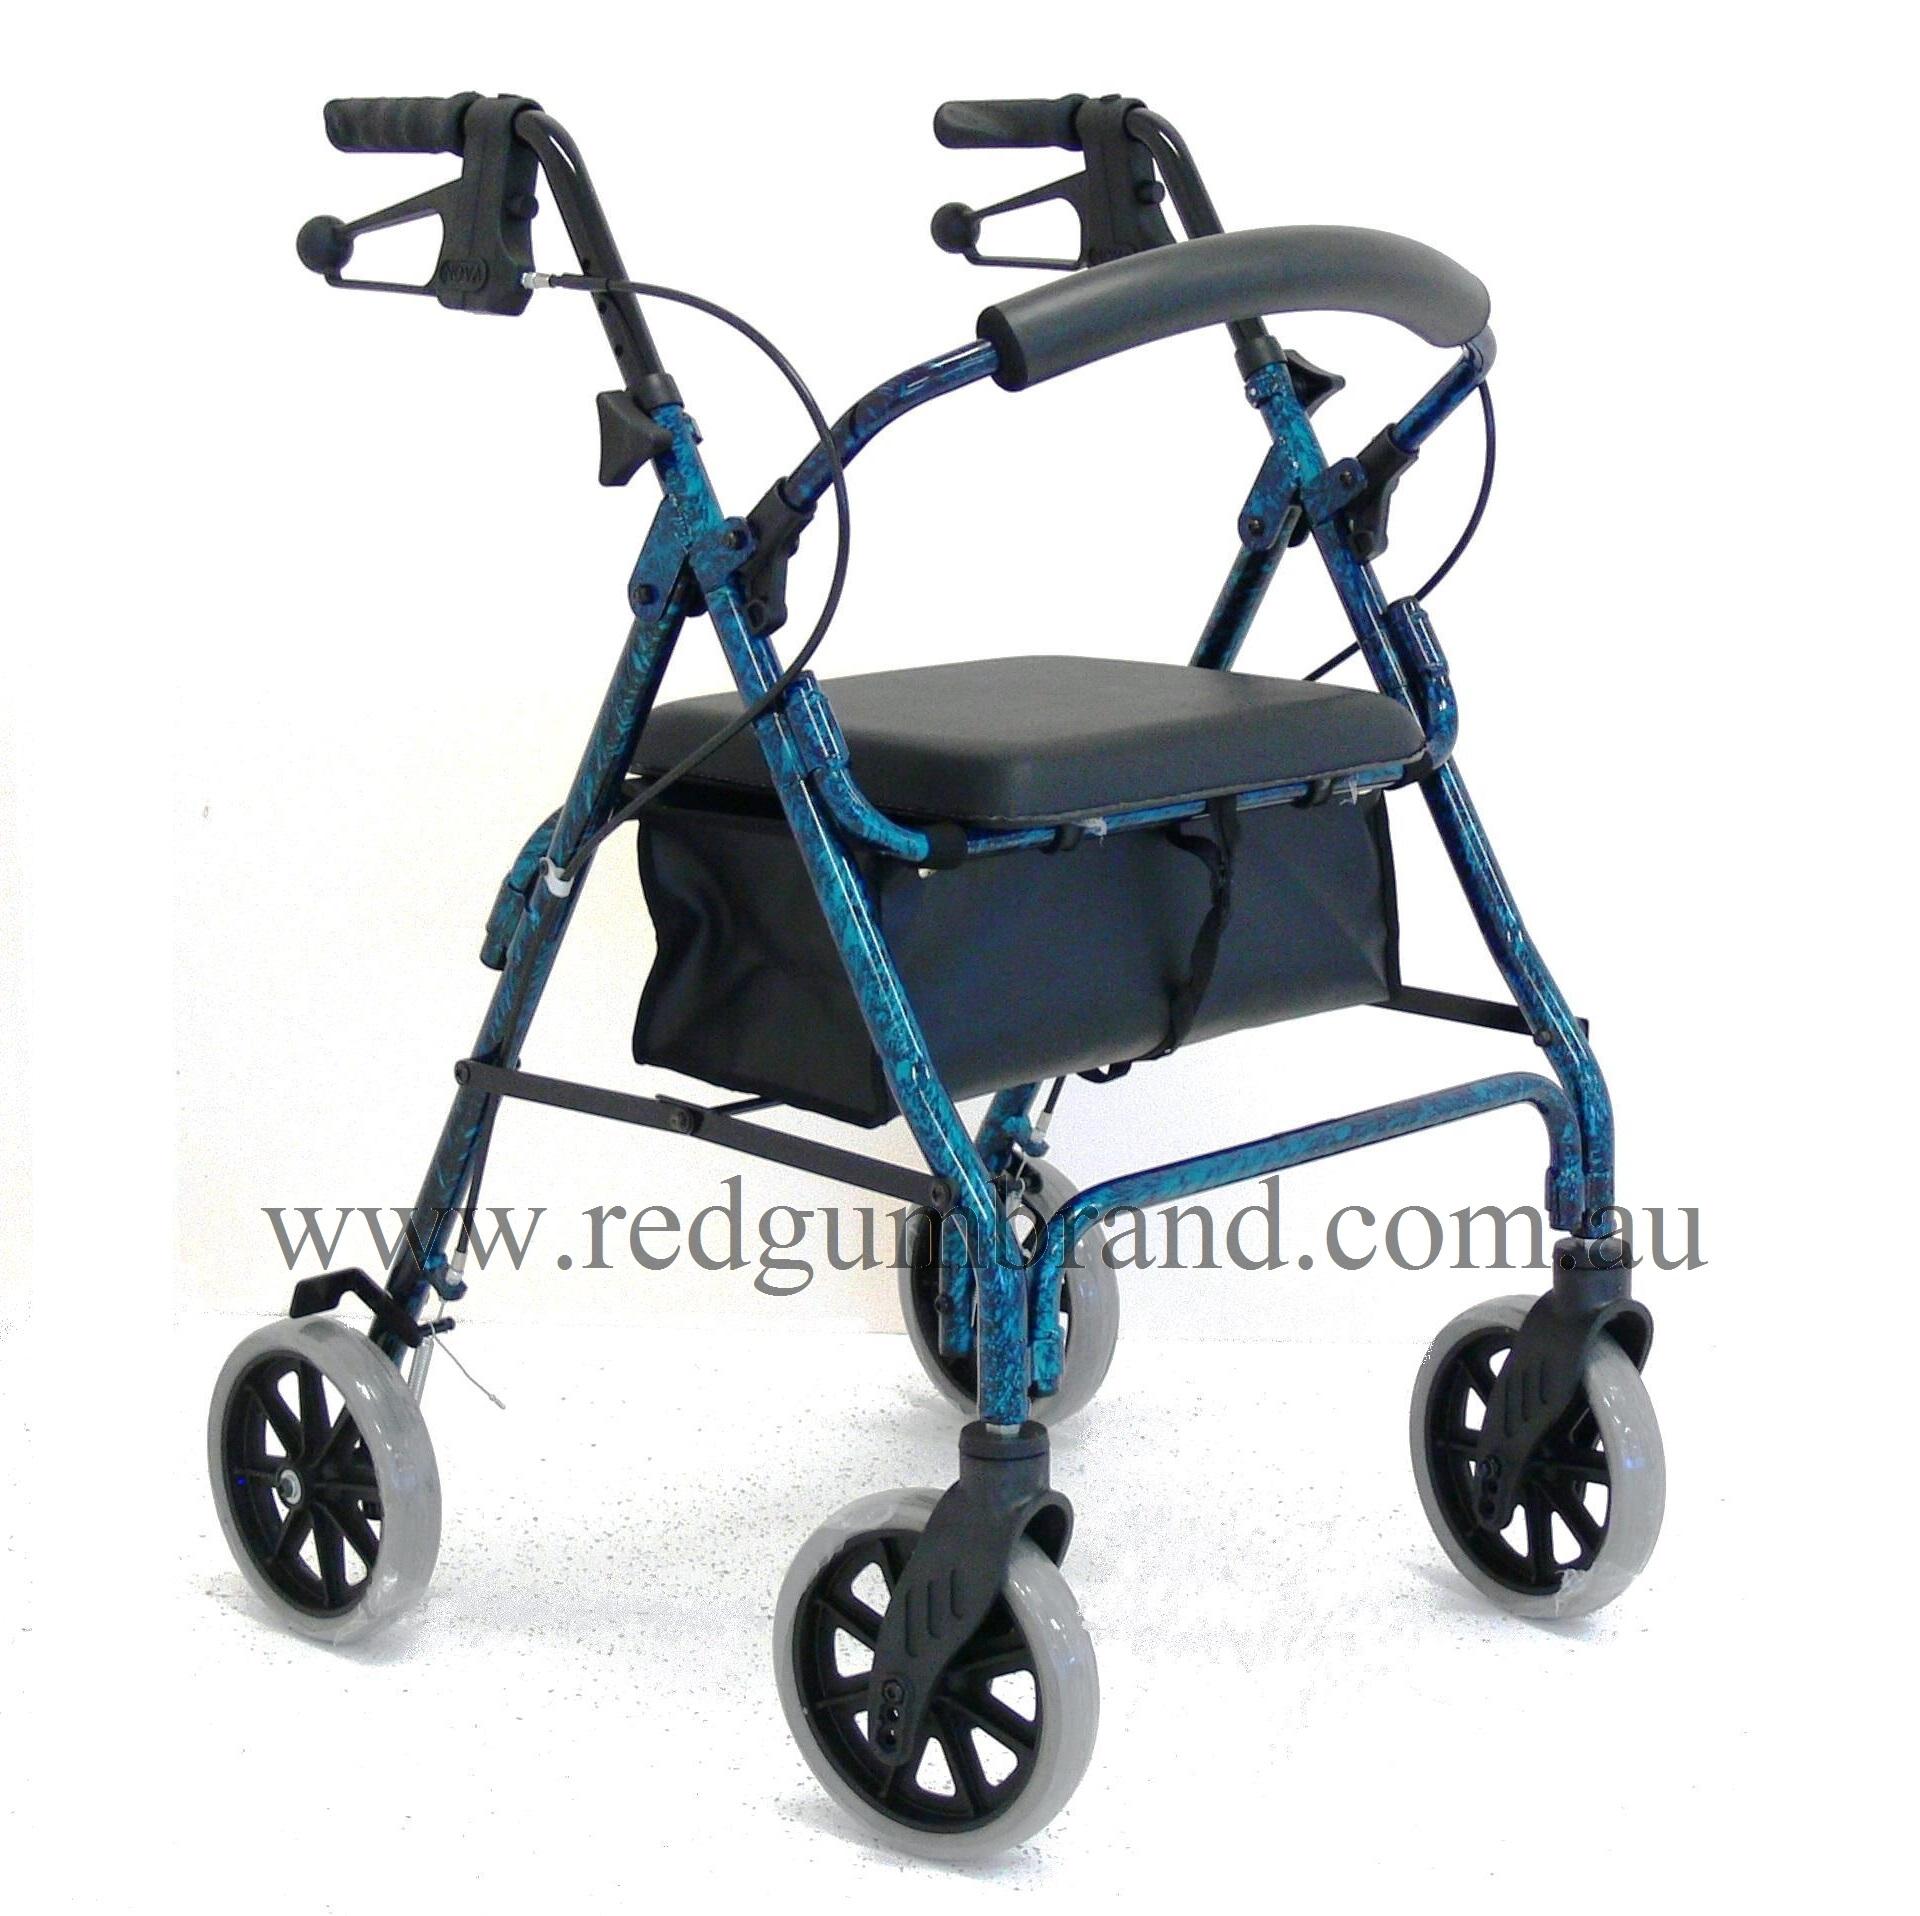 Pacer 8 Seat Walker (Tall)